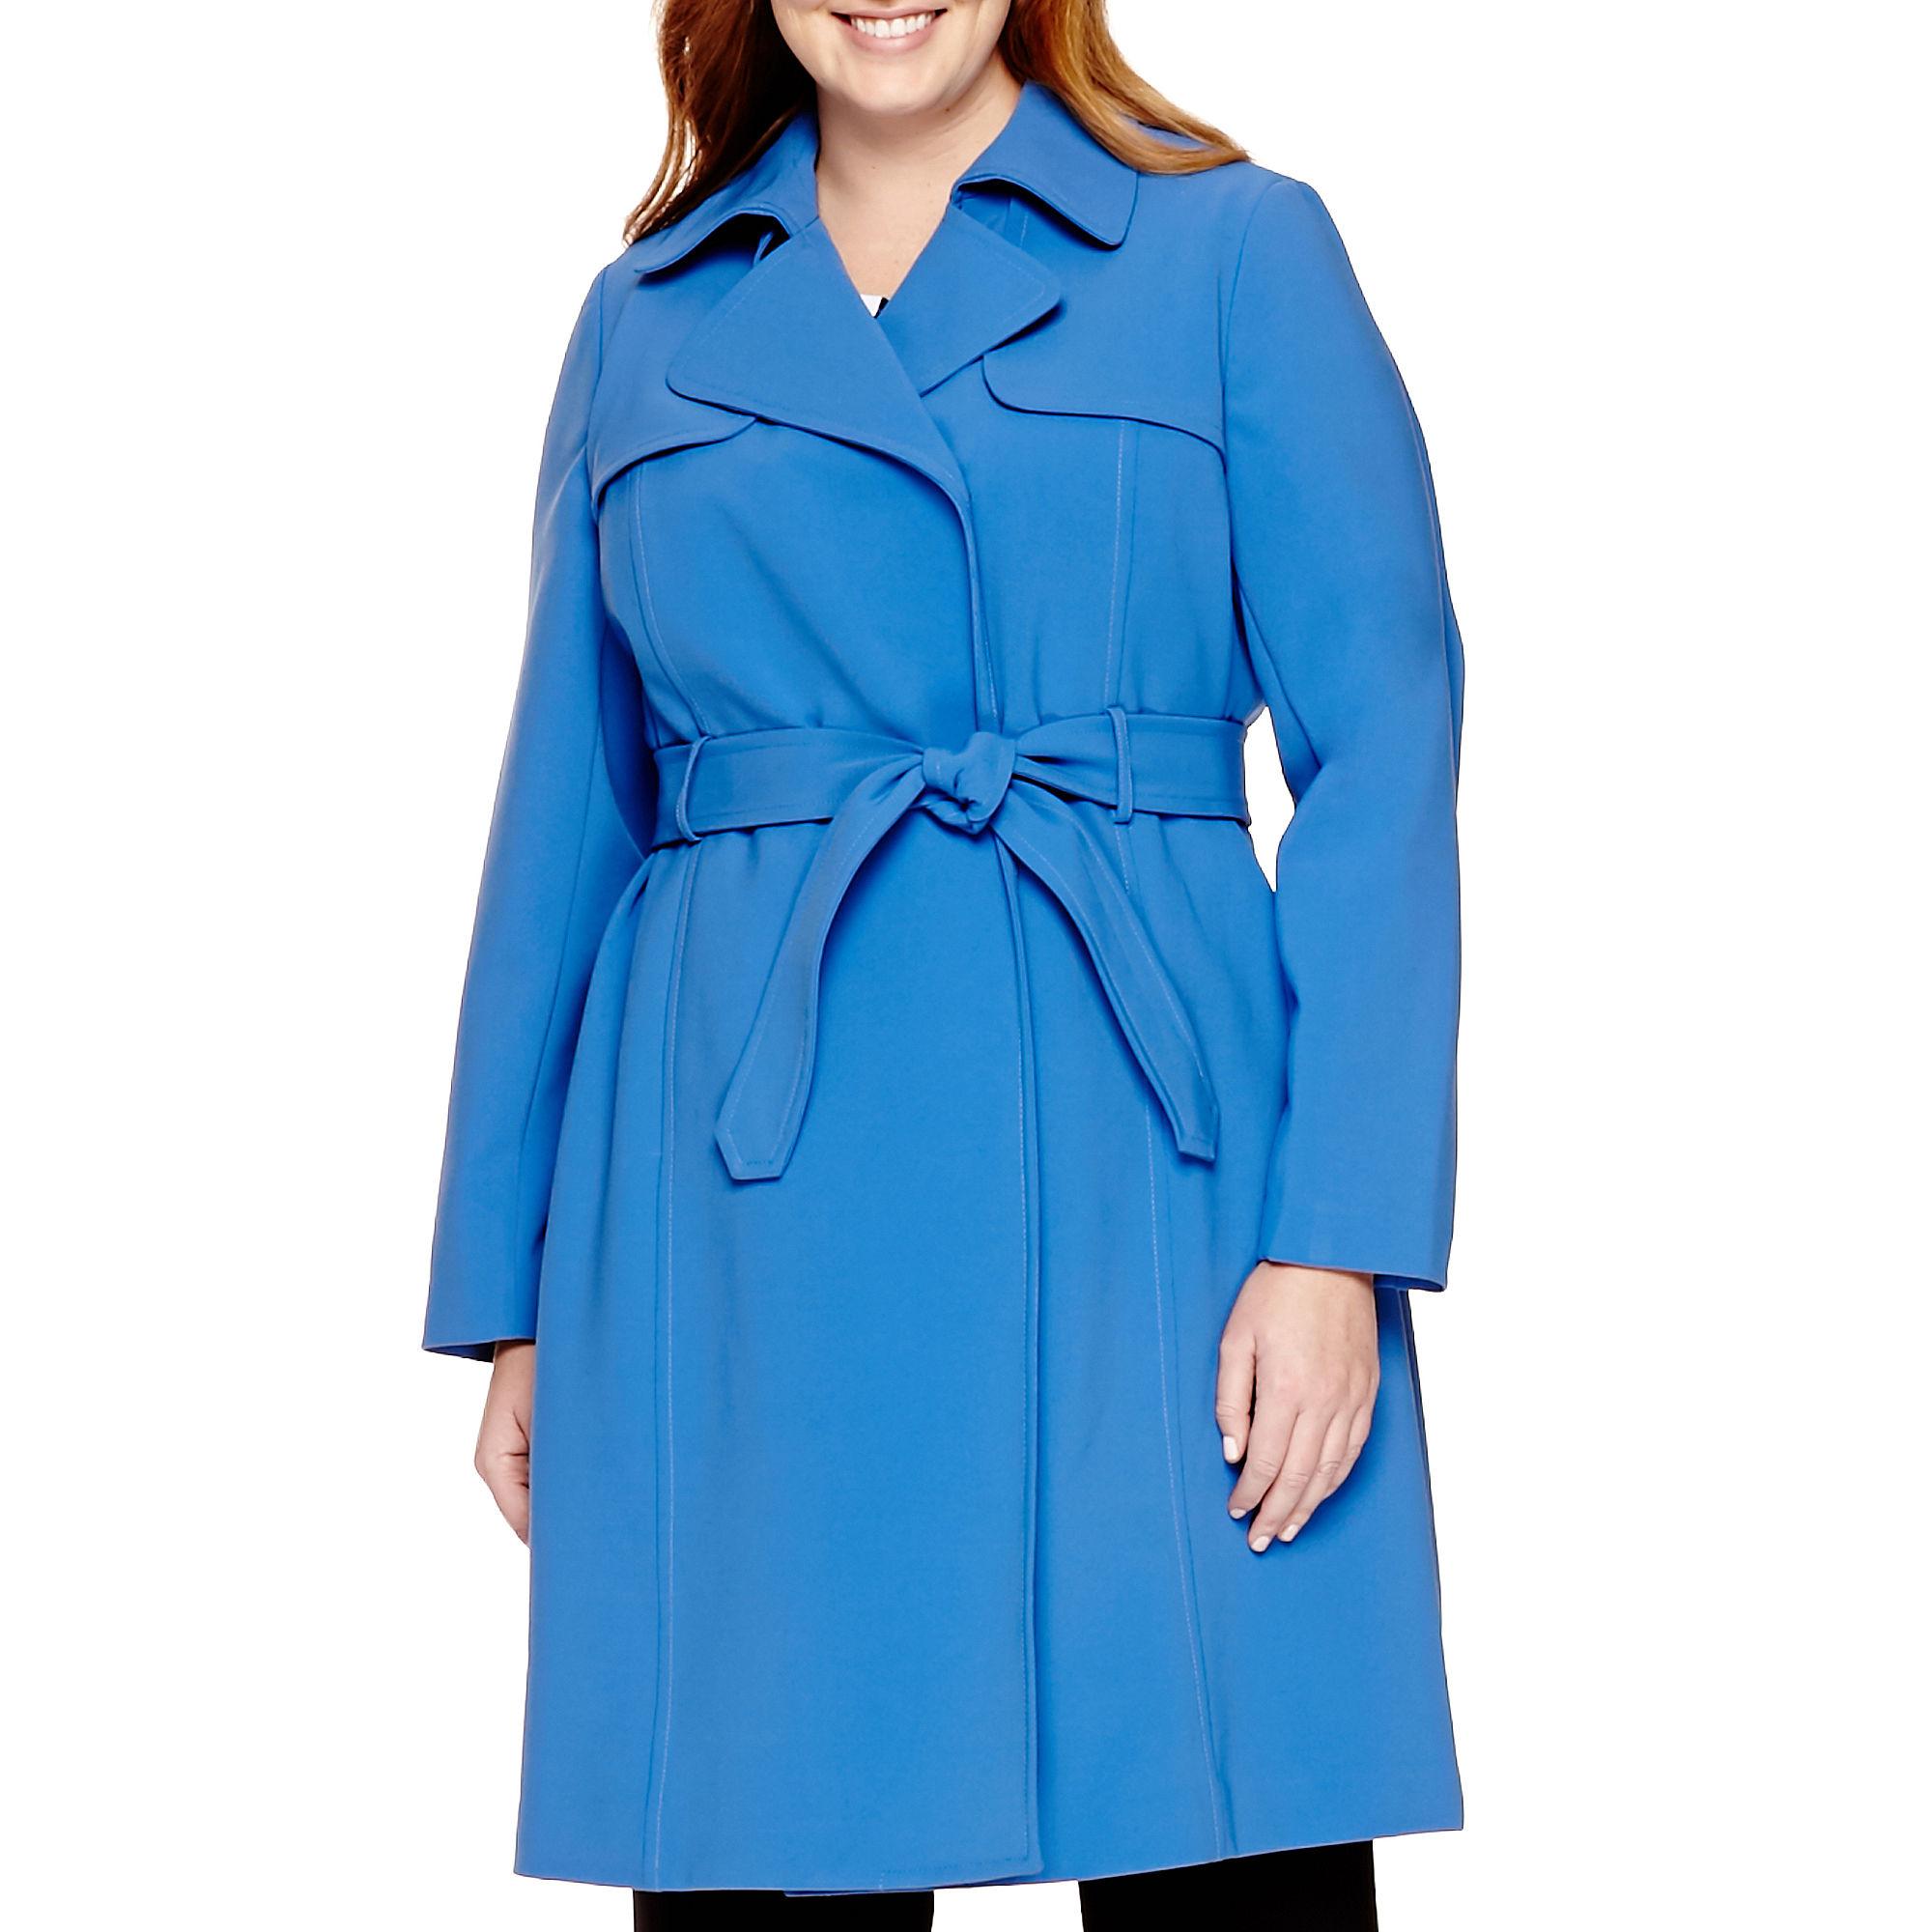 Liz Claiborne Belted Trench Coat - Plus